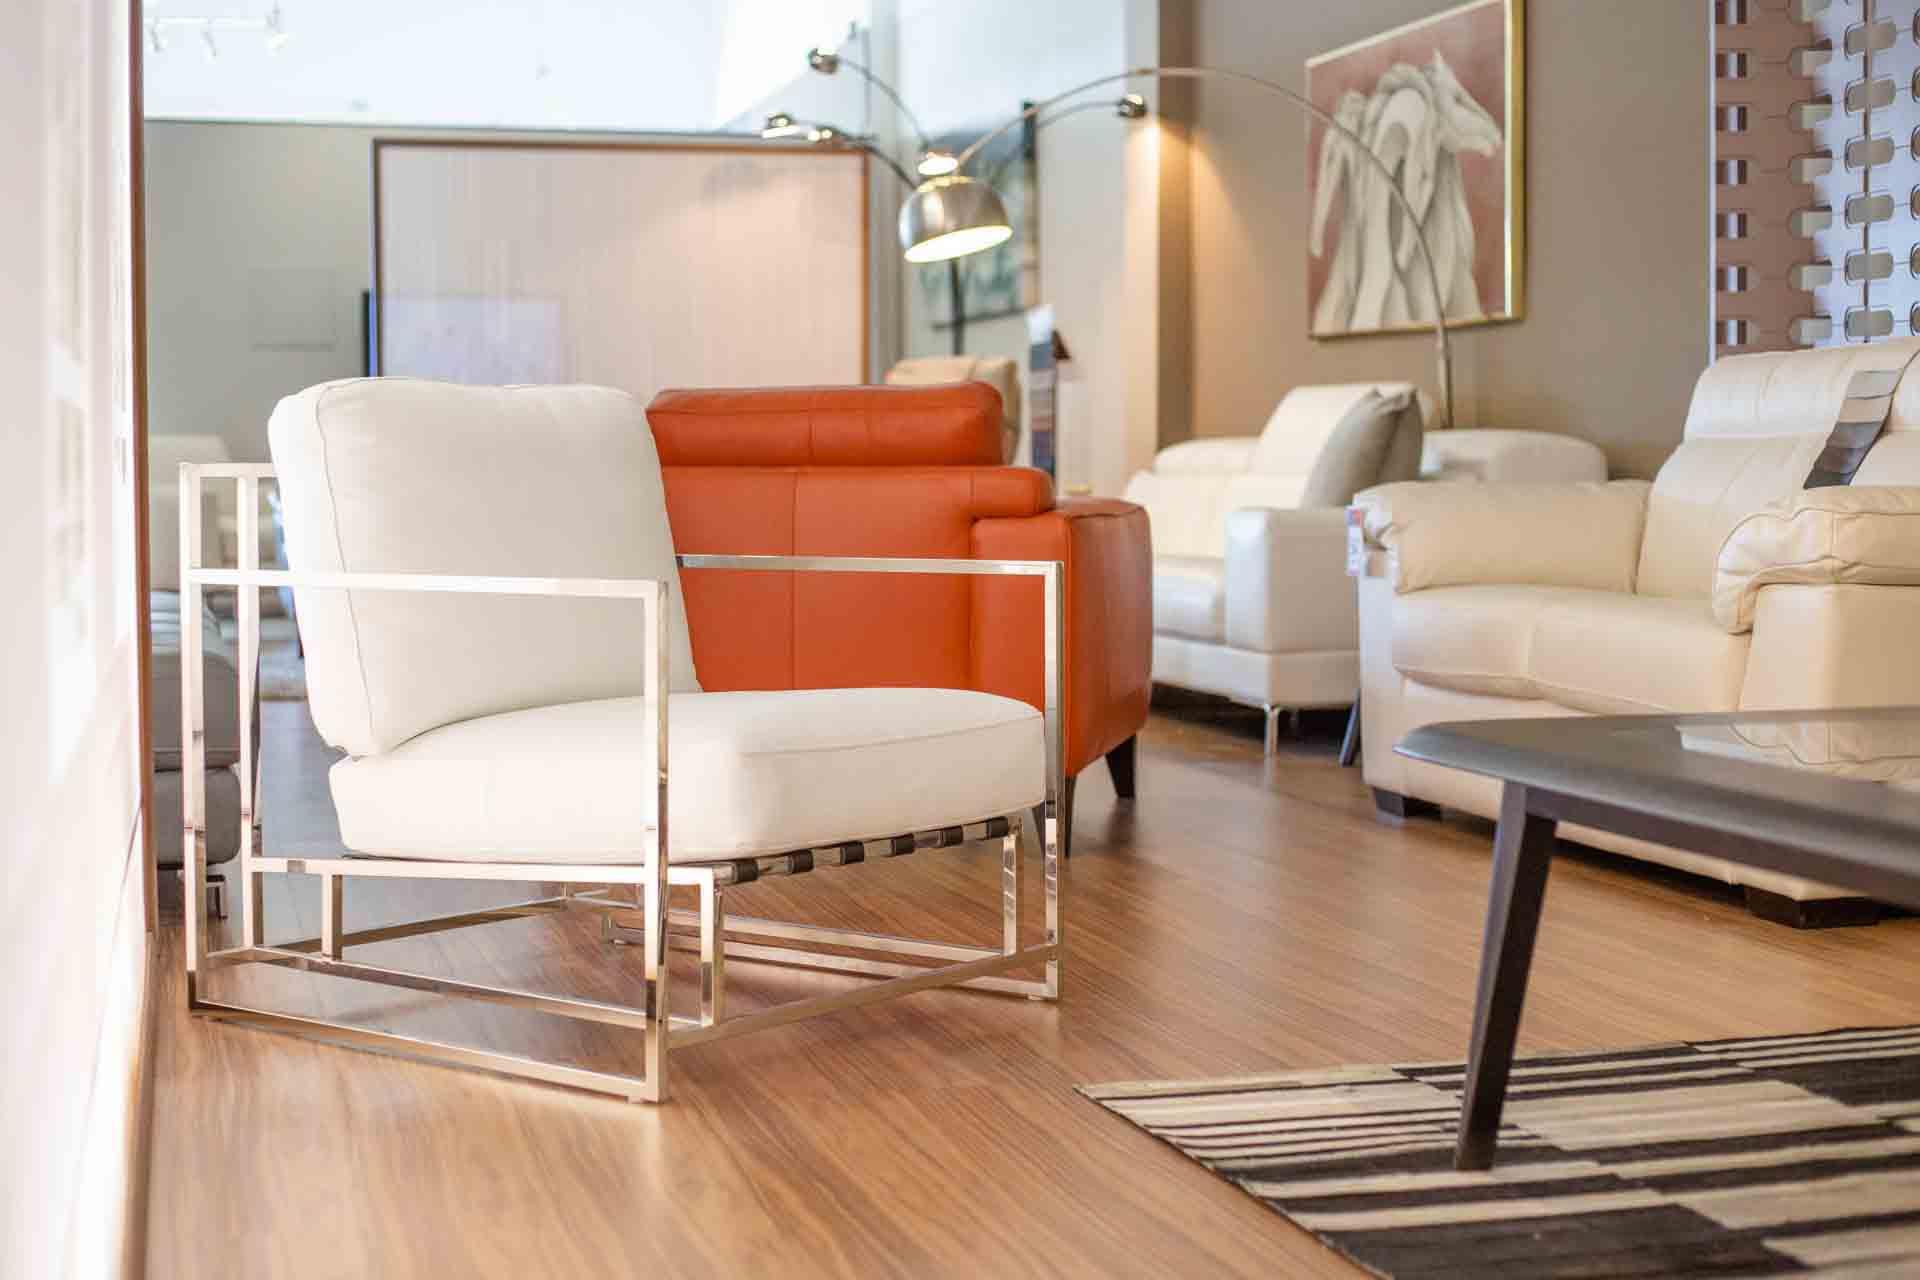 Furniture Divano | San Diego, California – Furniture Divano San Diego